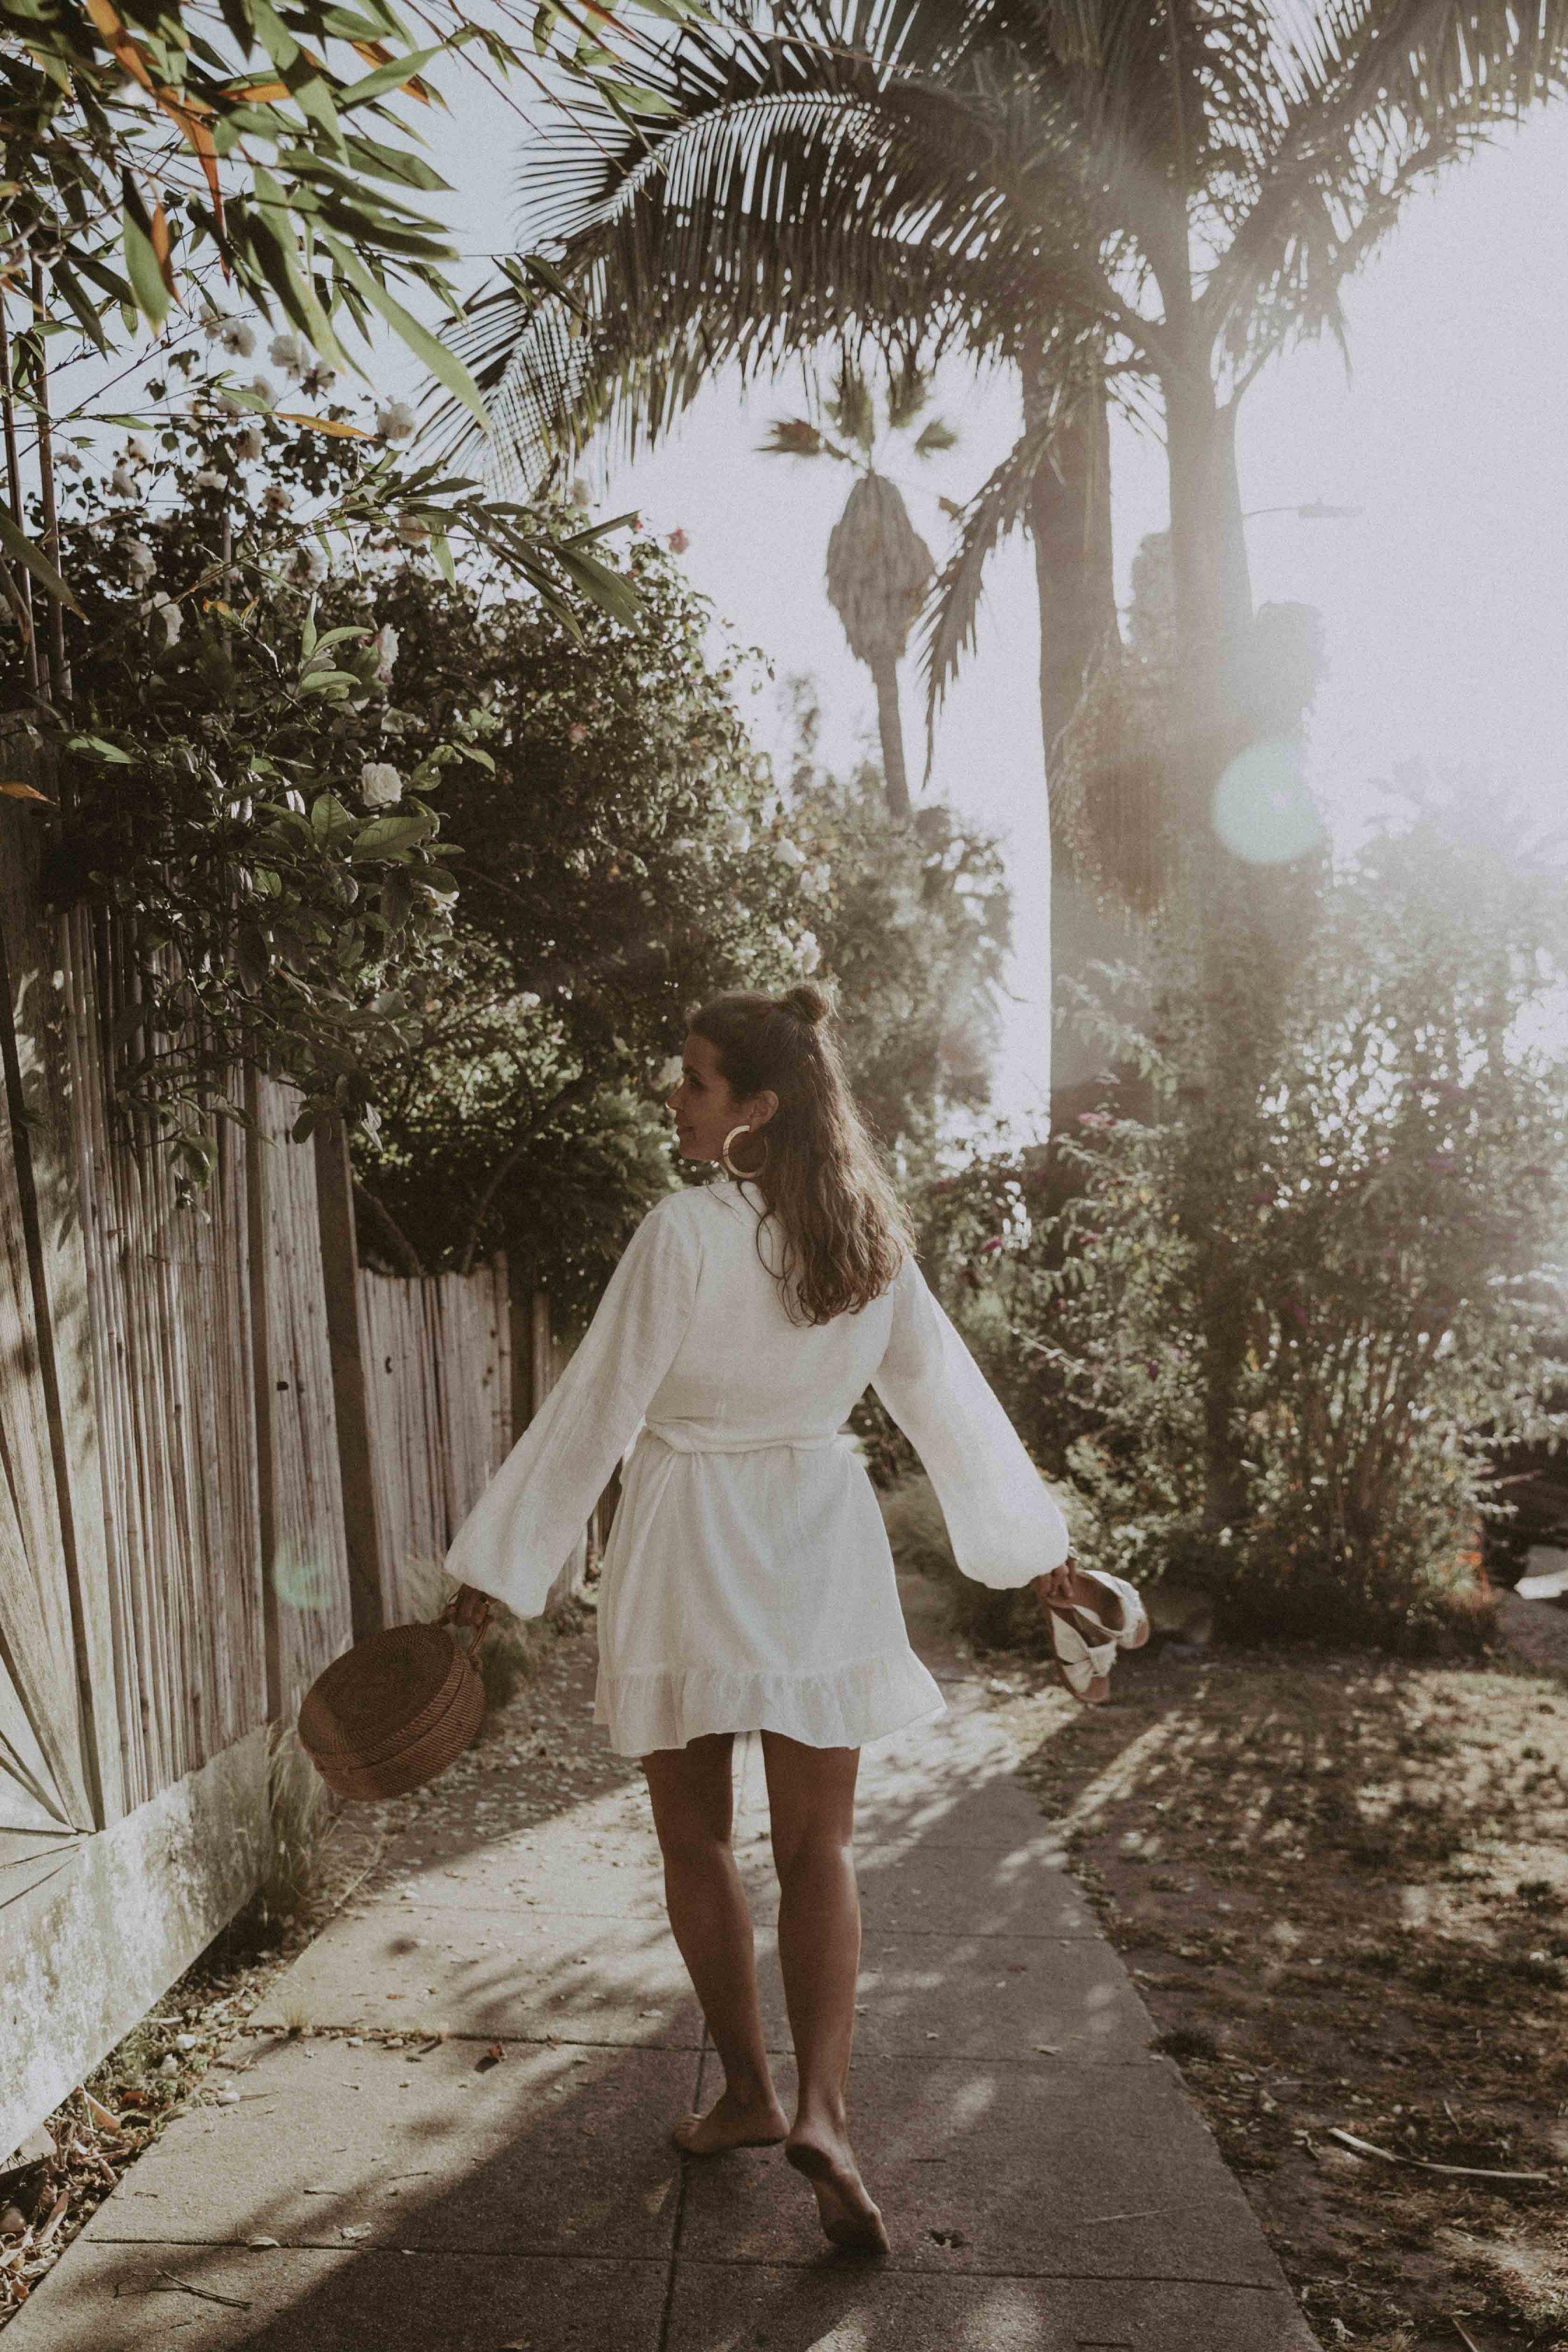 Summer dress and flat sandals around Venice Beach, California